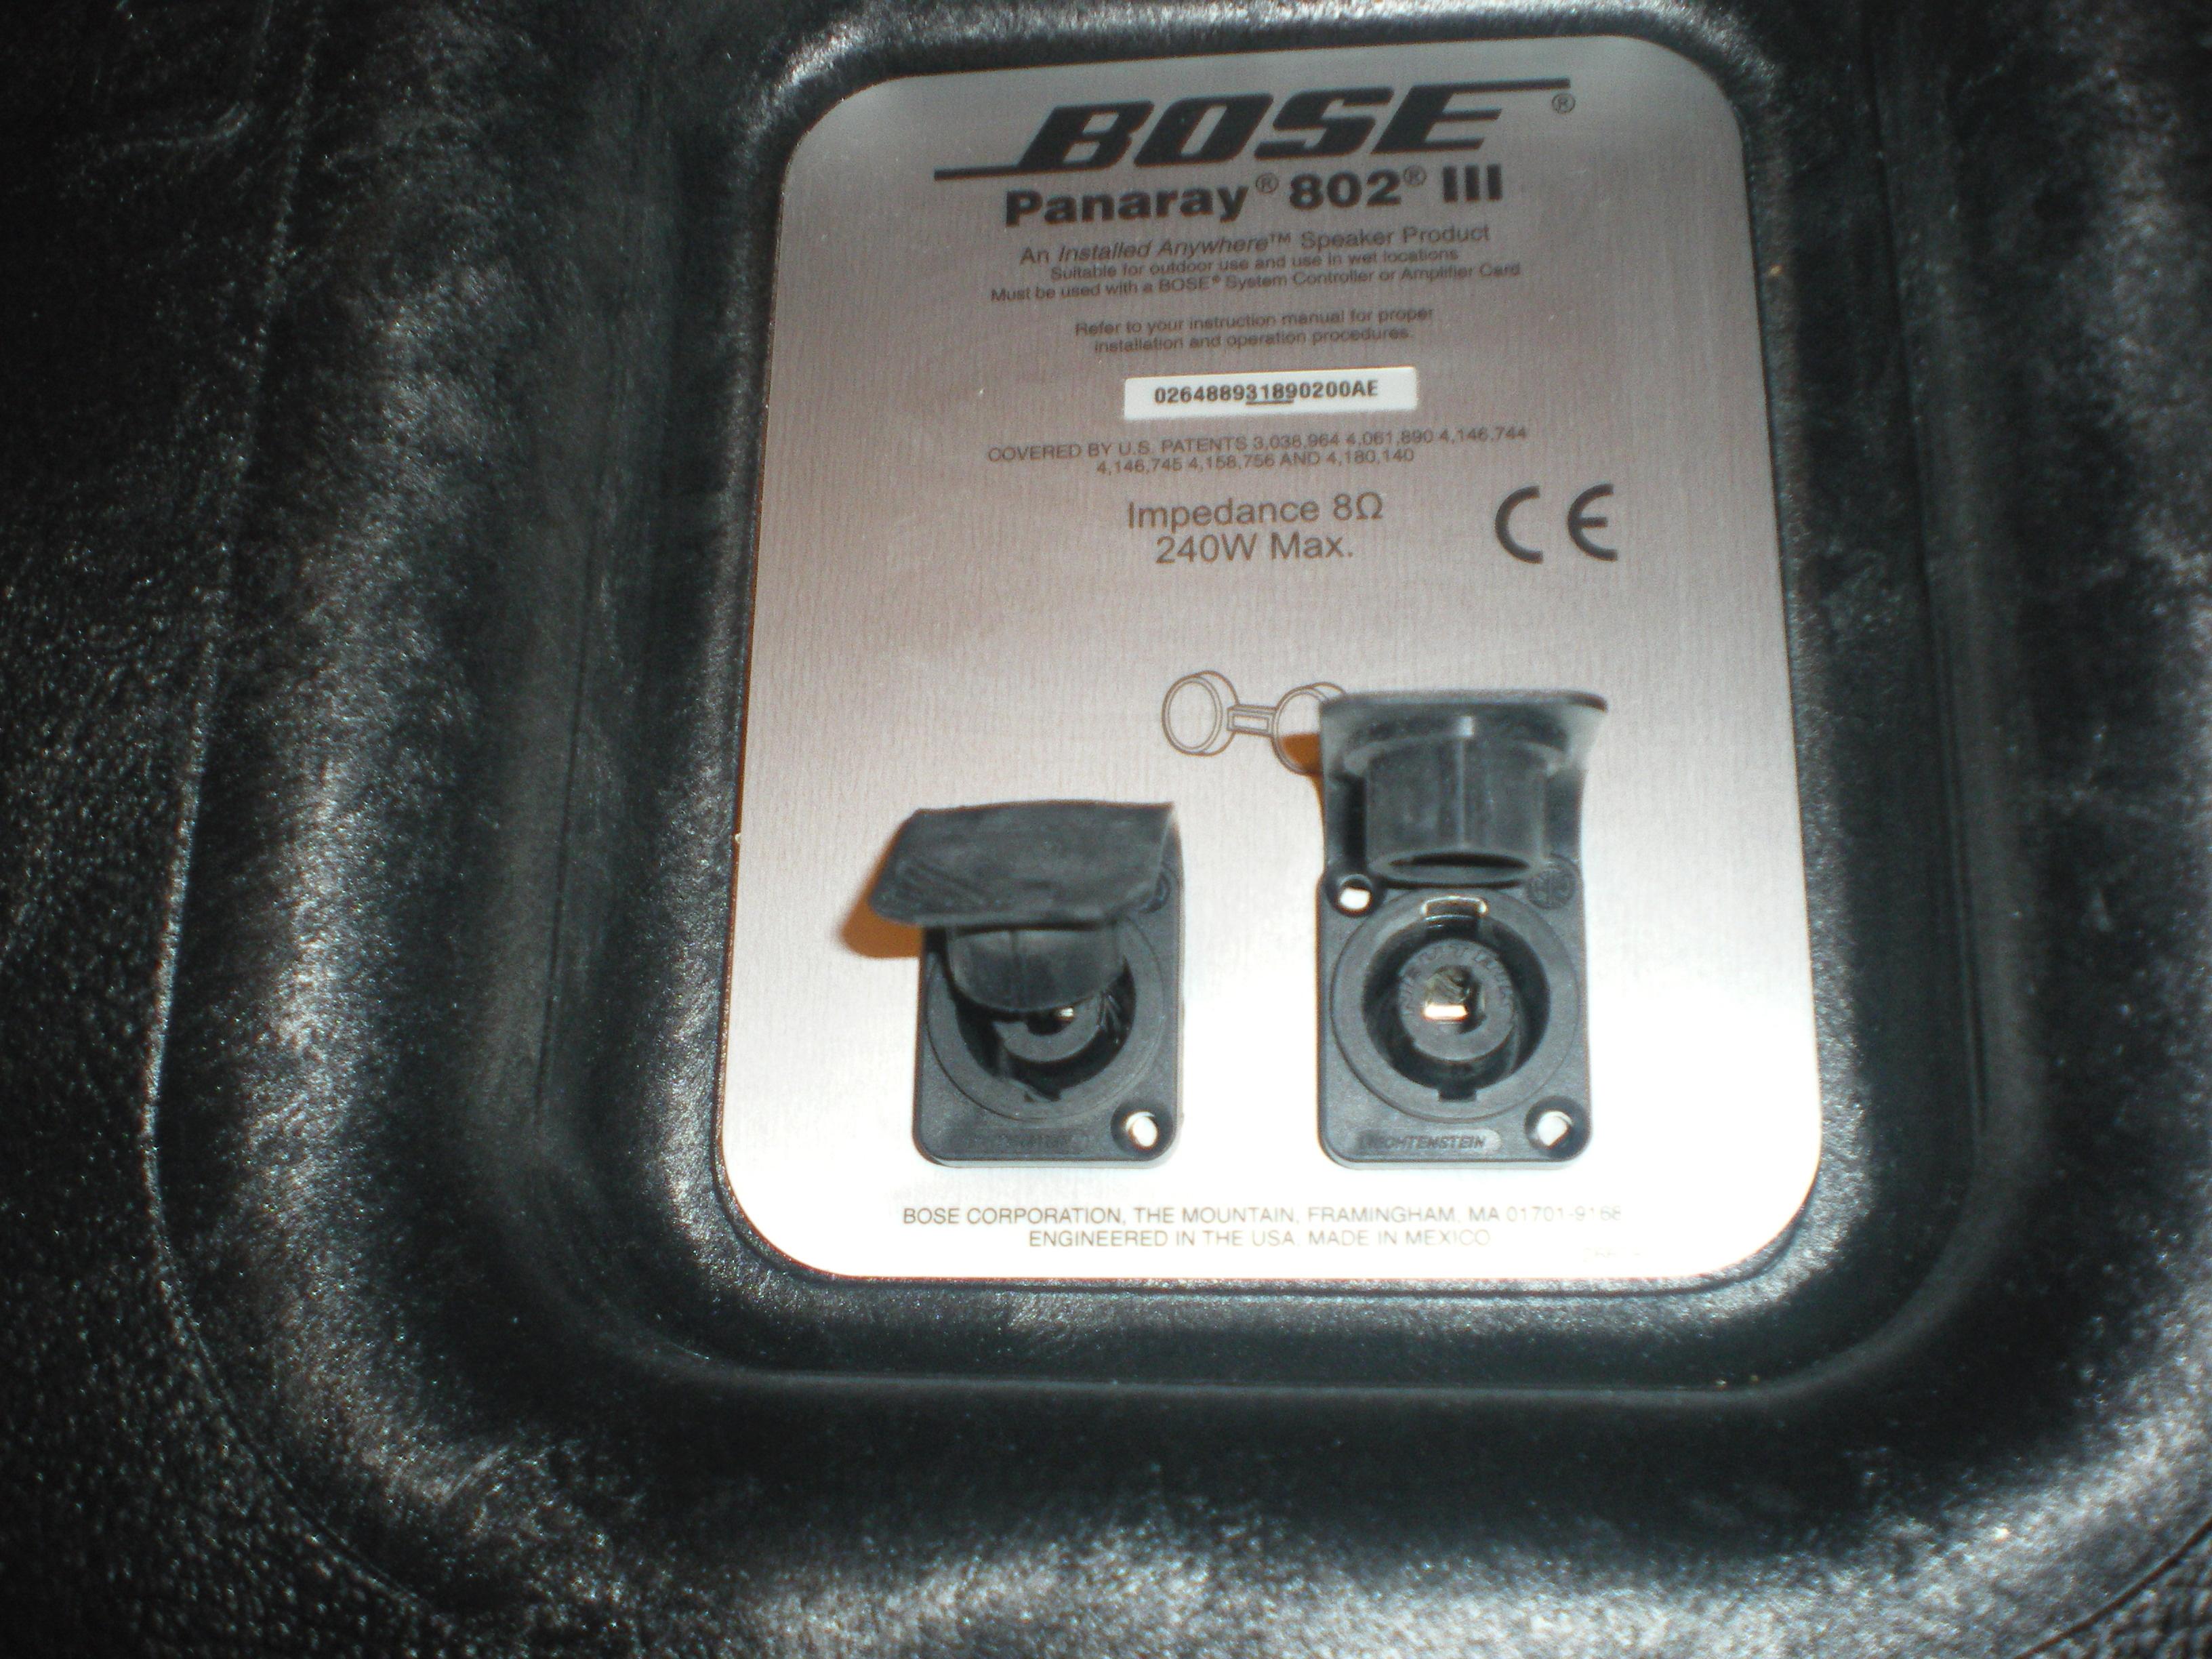 bose 802 iii 240 watt loudspeaker black rh markertek com Bose 802 Speakers Specs bose panaray 802 iii loudspeaker manual